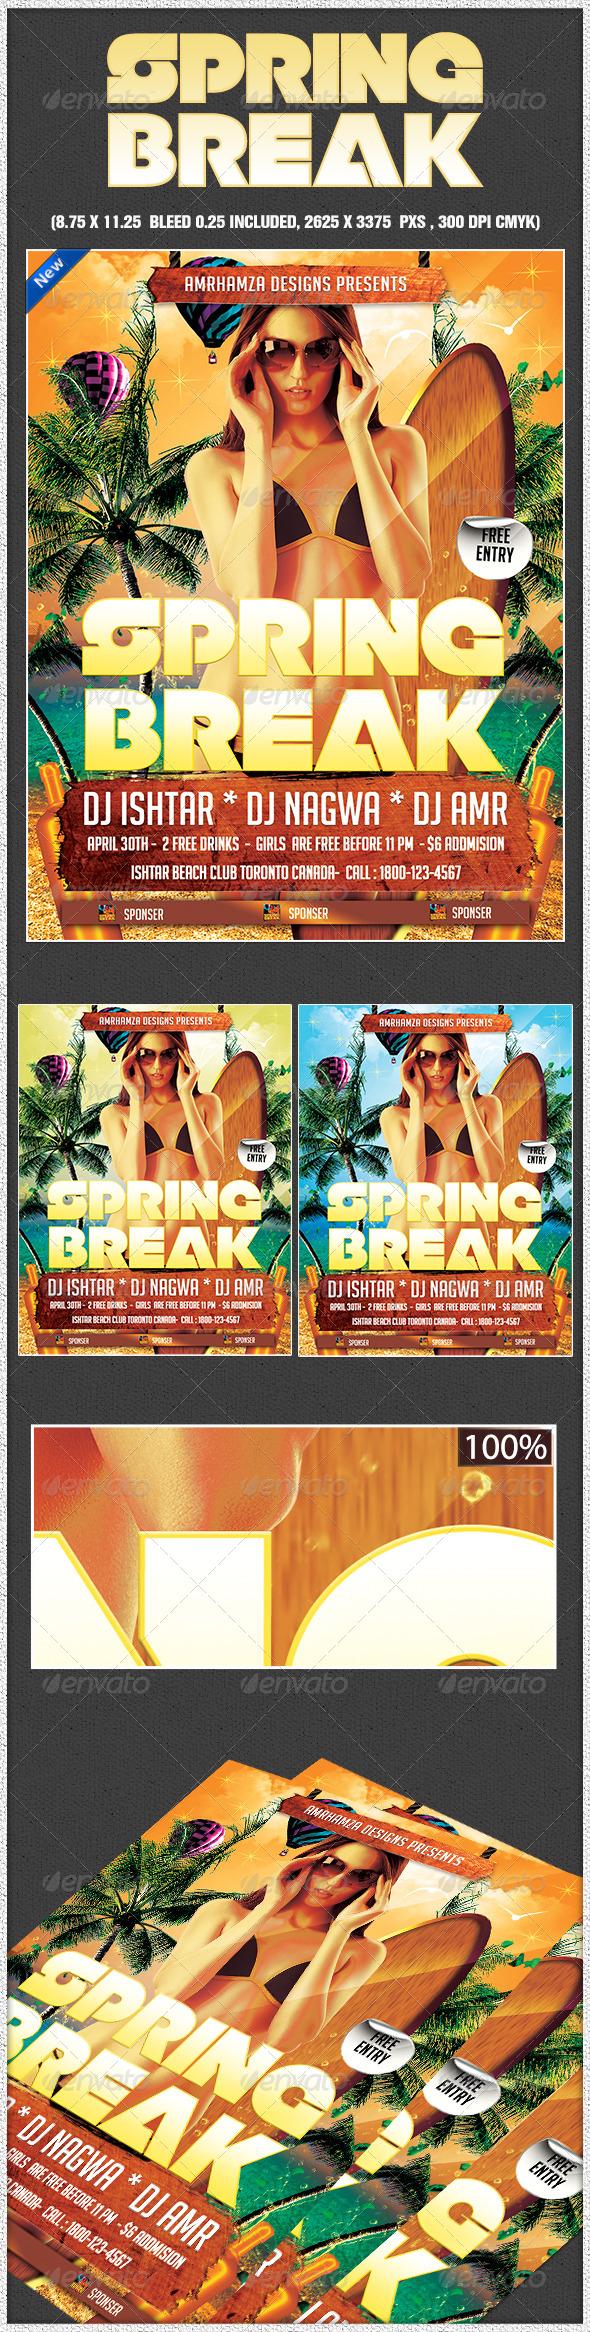 Spring Break Surf Beach Club Party - Holidays Events